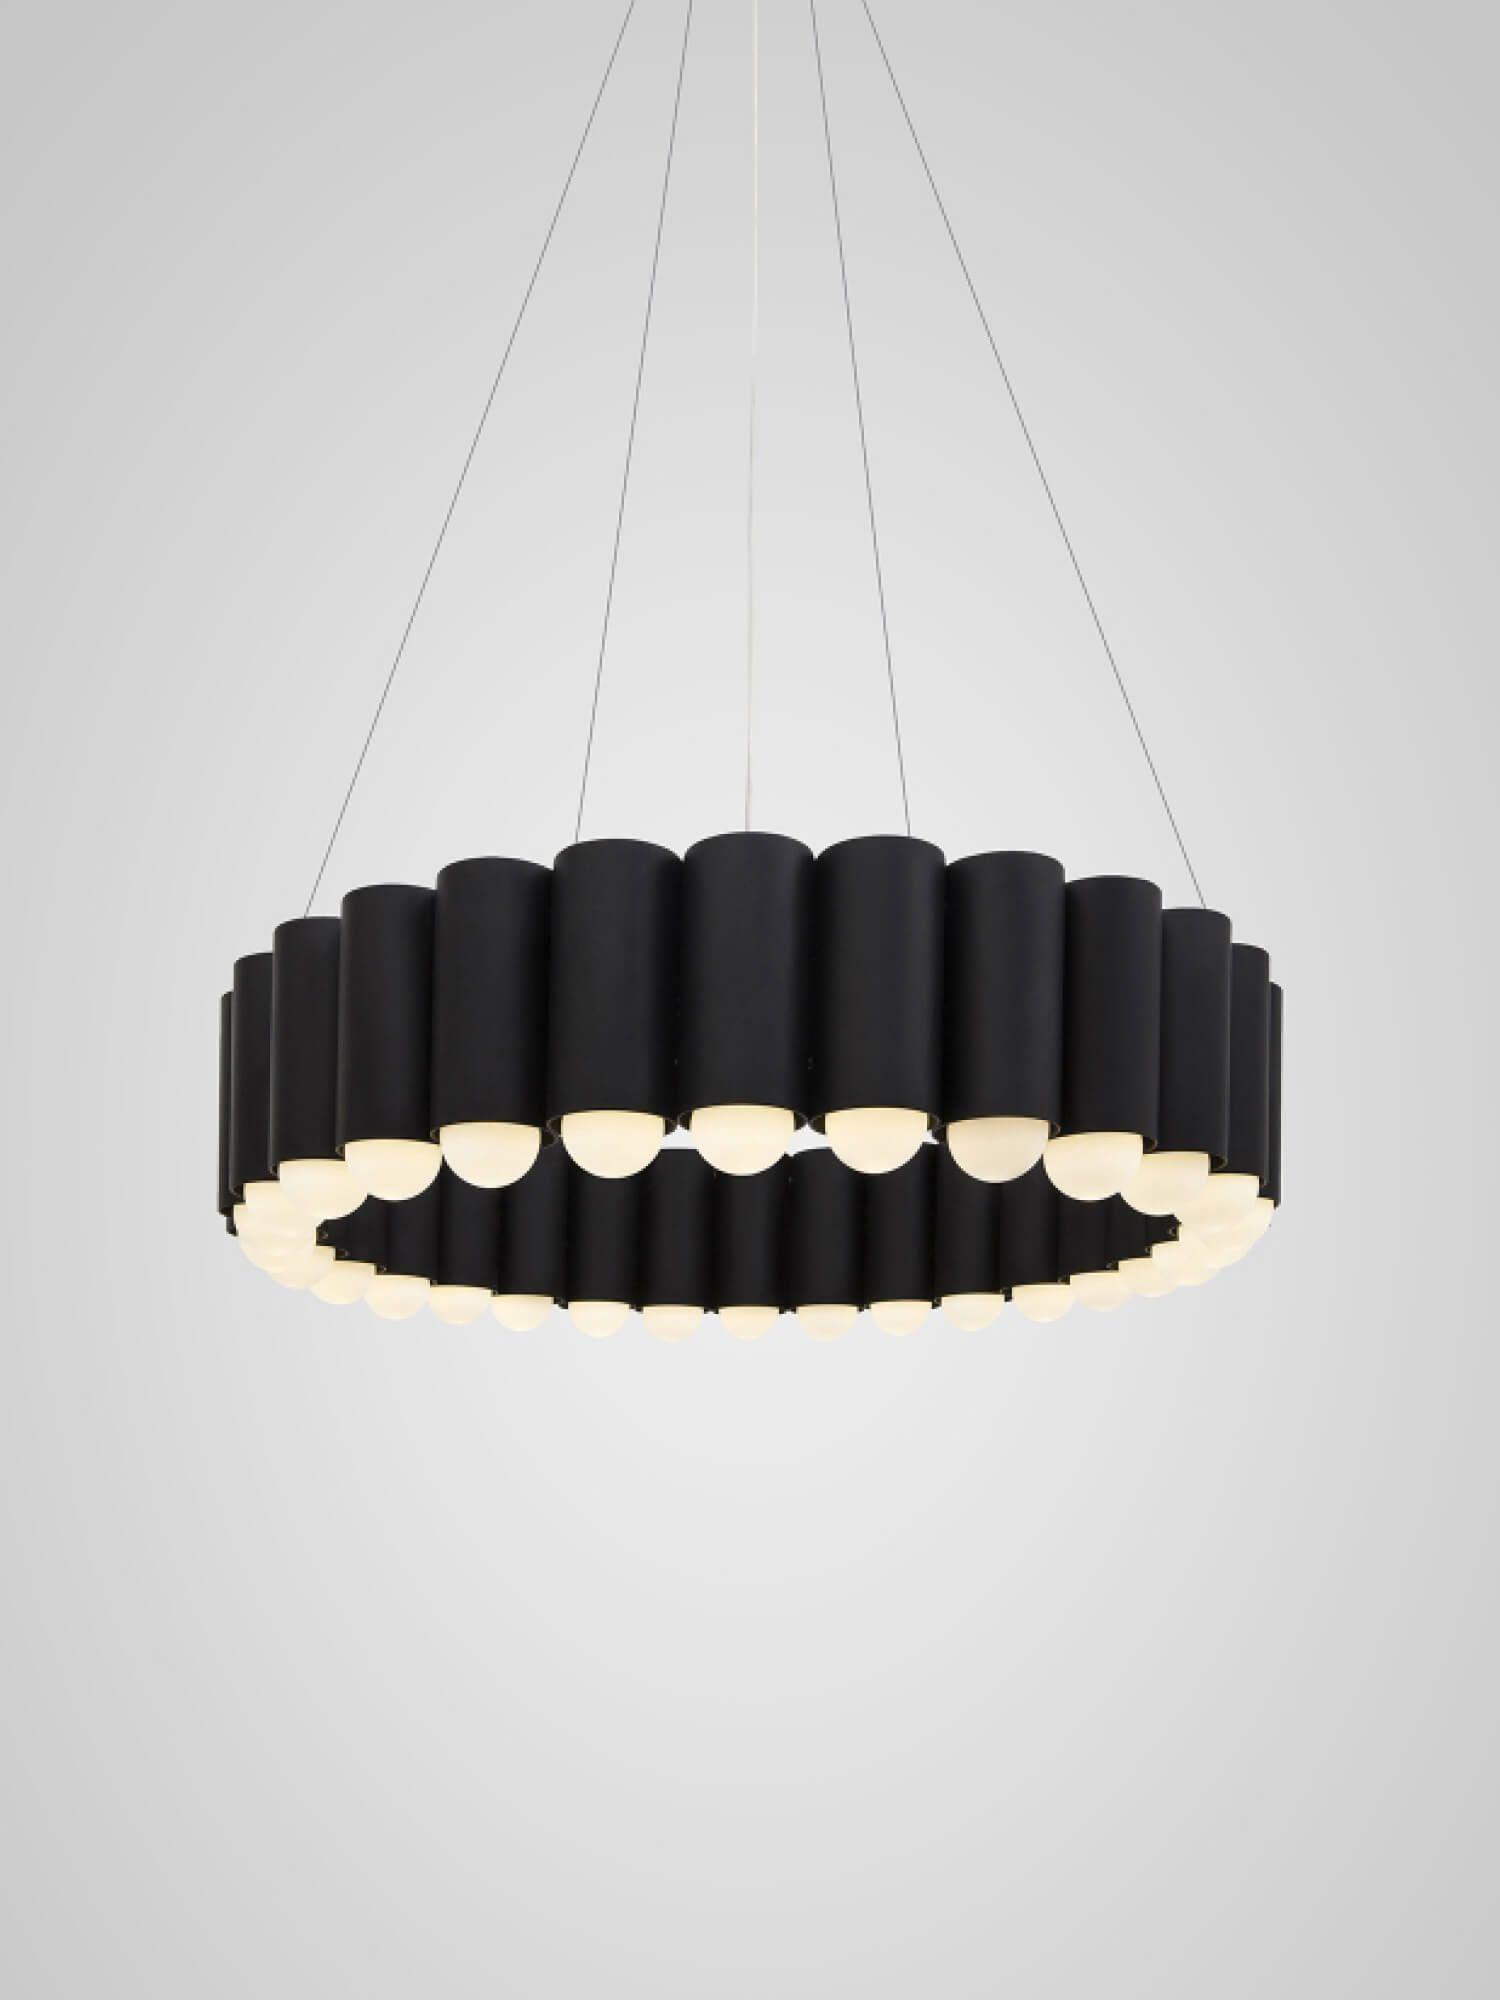 Carousel Pendant Light By Lee Broom For Space Furniture Est Living Design Directory Pendant Light Library Lighting Light